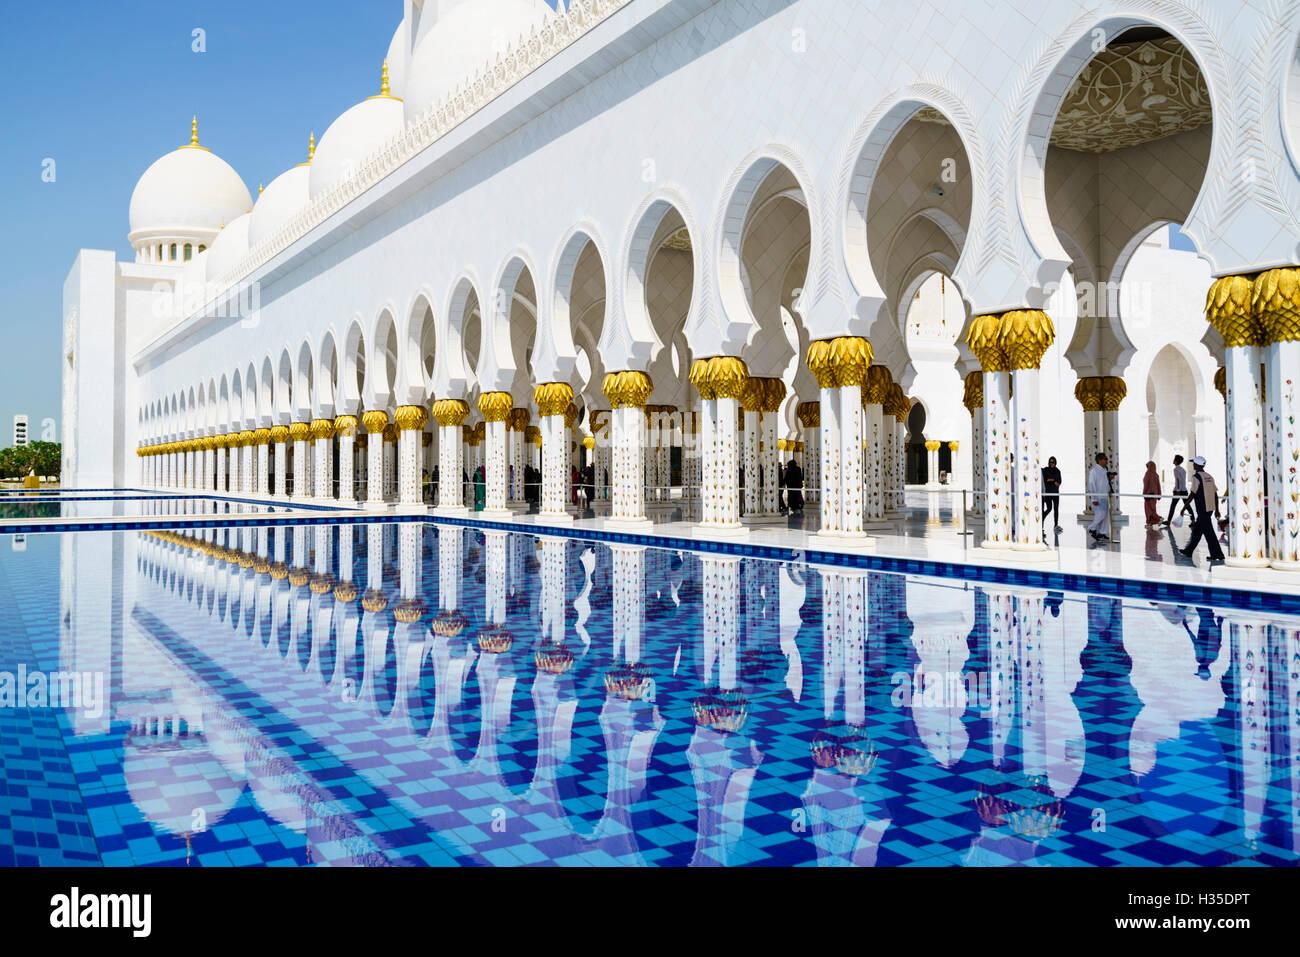 Moschea Sheikh Zayed, Abu Dhabi, Emirati Arabi Uniti, Medio Oriente Immagini Stock